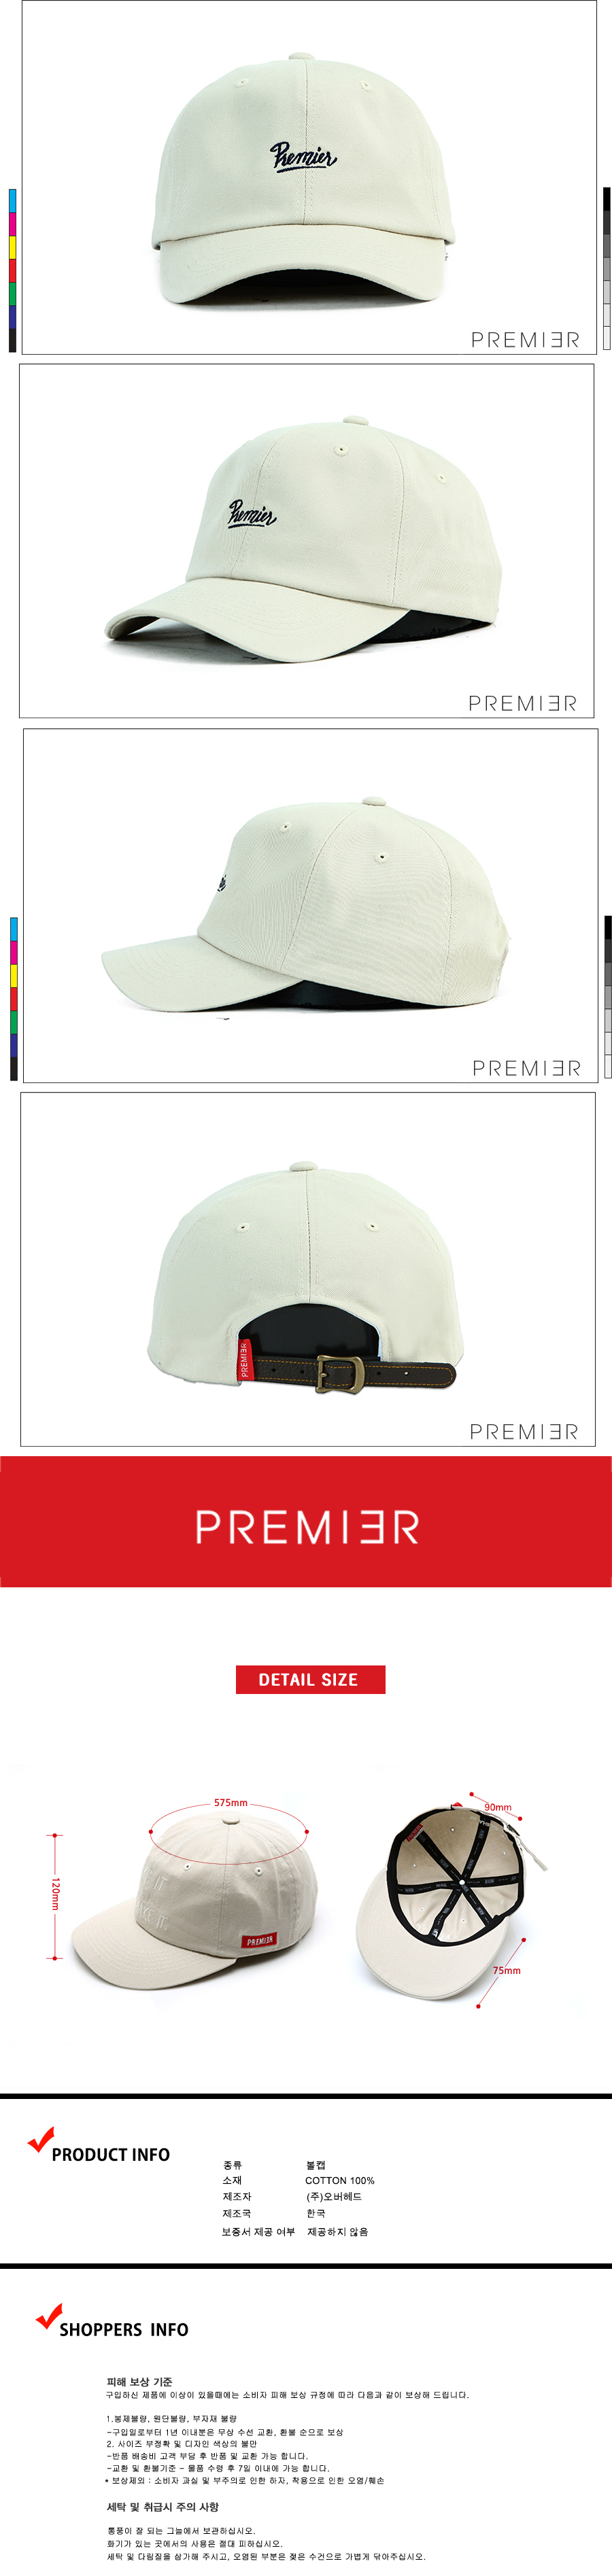 [ PREMIER ] [Premier] Ball Cap Premier Underline Beige (P903)